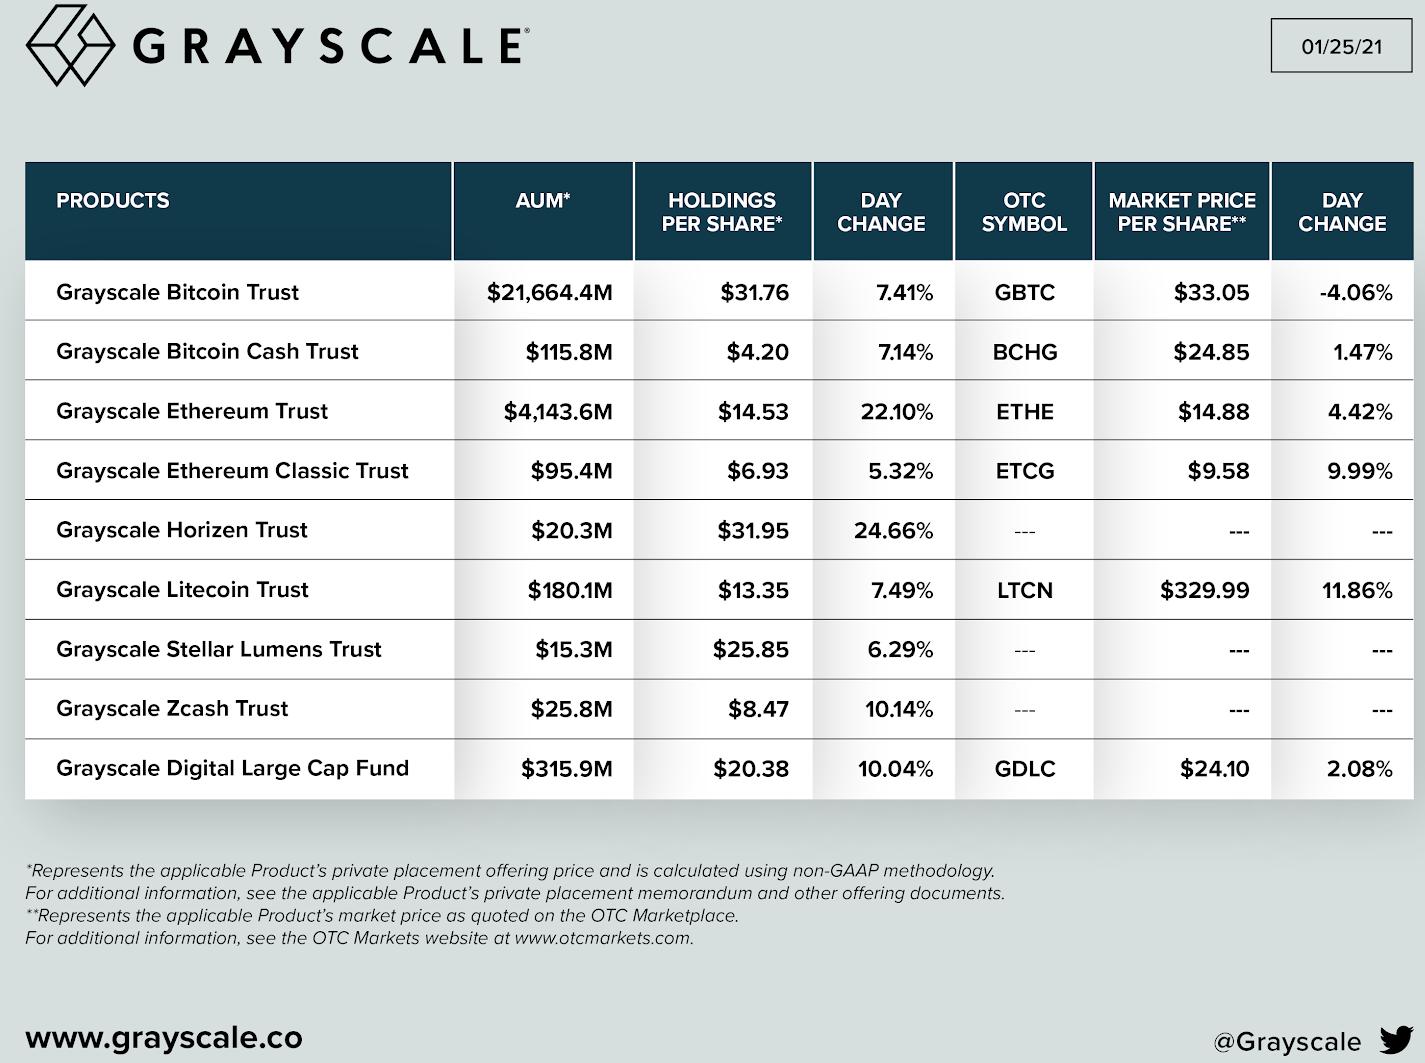 bitcoin grayscale chart 012821